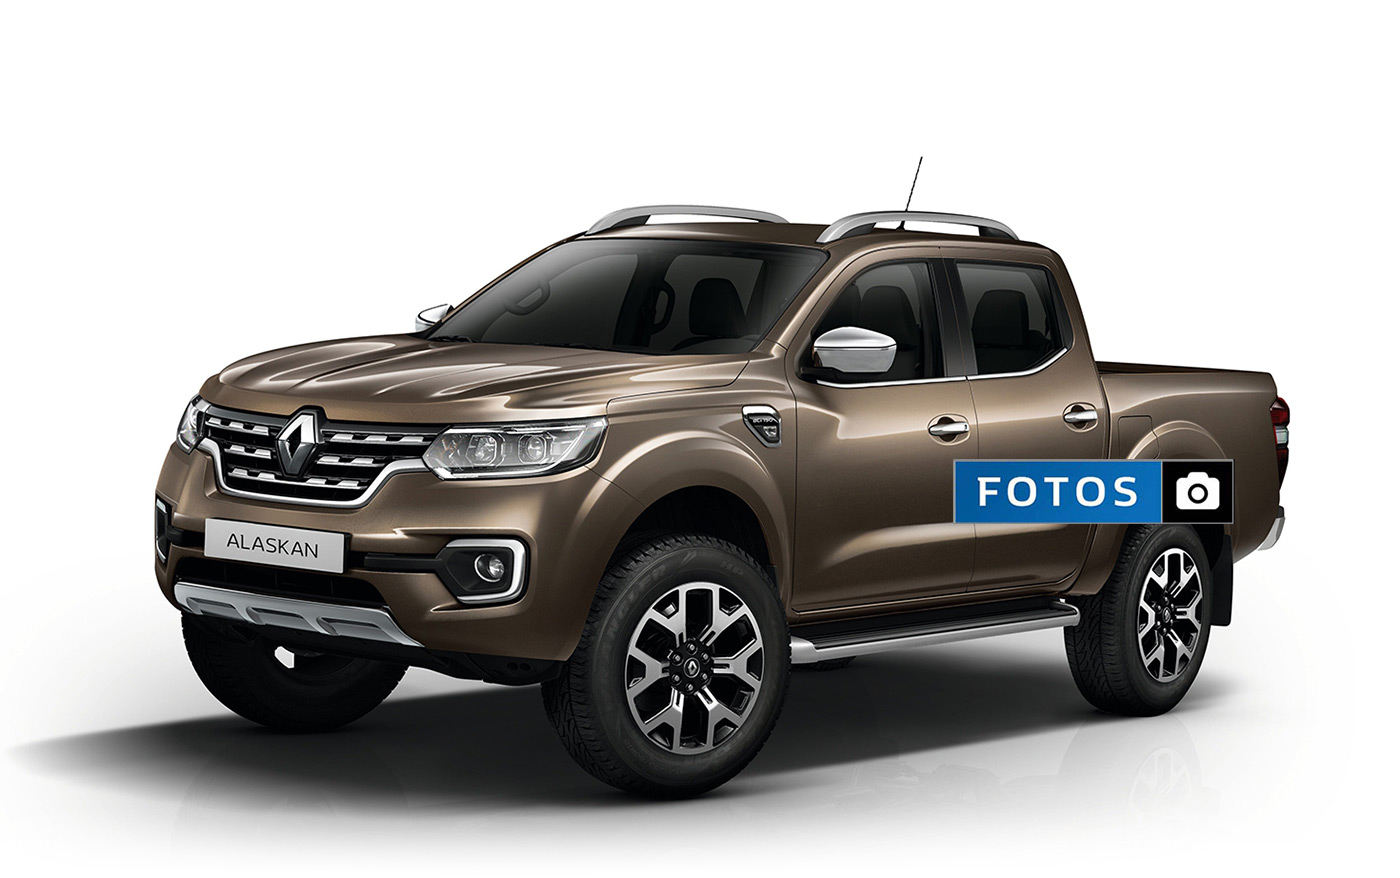 Renault Alaskan 2017 Angebote und Preise